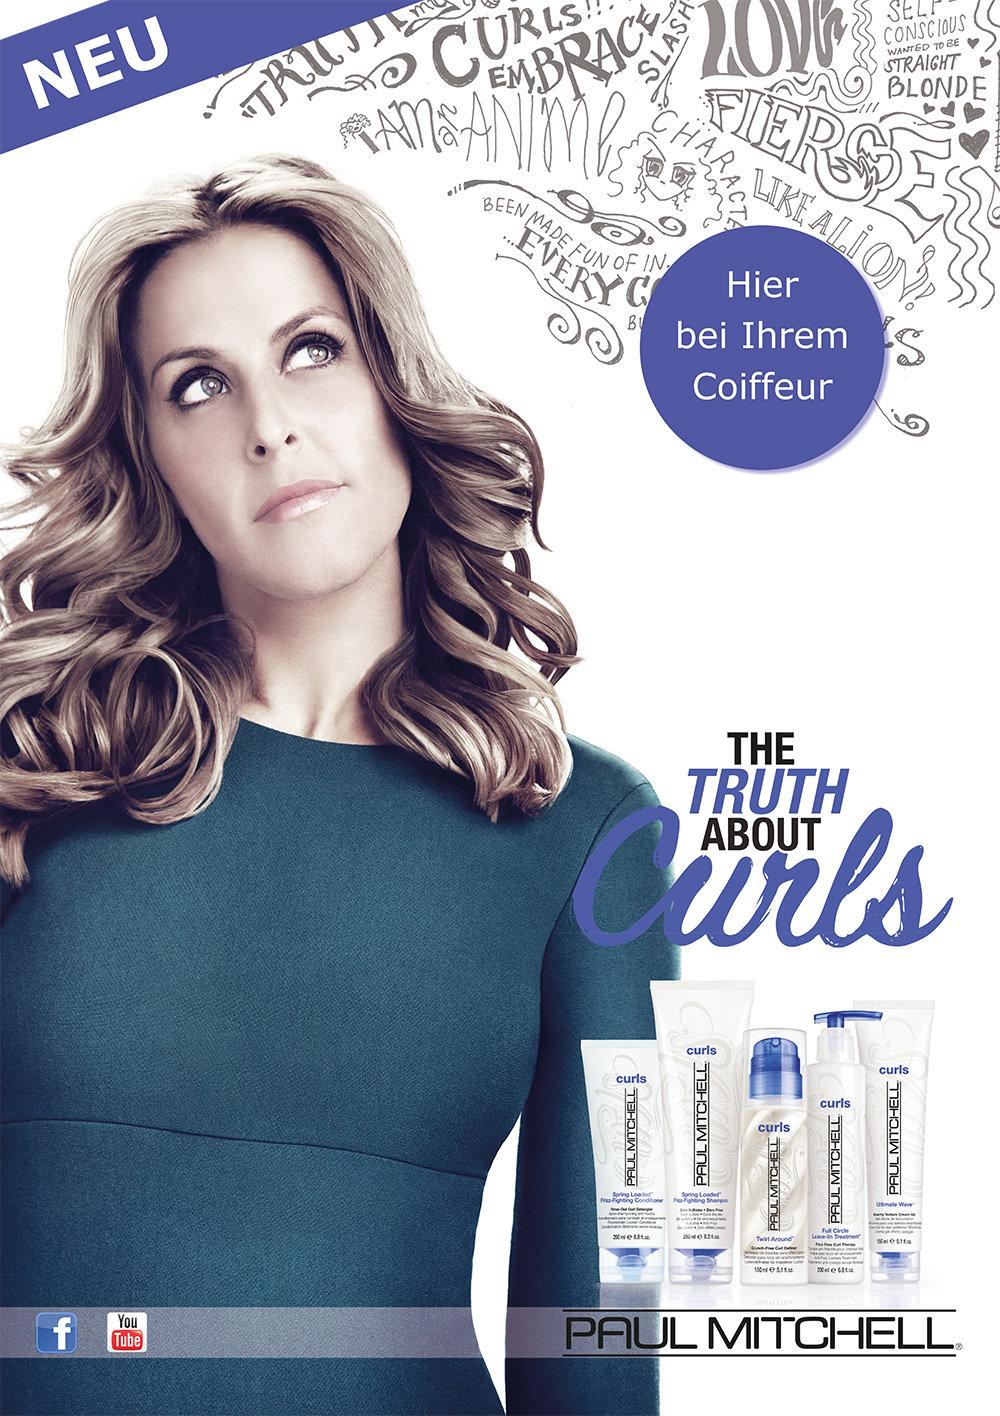 merek merk brand shampo perawatan kecantikan rambut branded conditioner salon beauty kecantikan klinik blogger vlogger indonesia review produk terbaik kesehatan sesuai tepa jenis rambut kapster hairstylist hairdresser